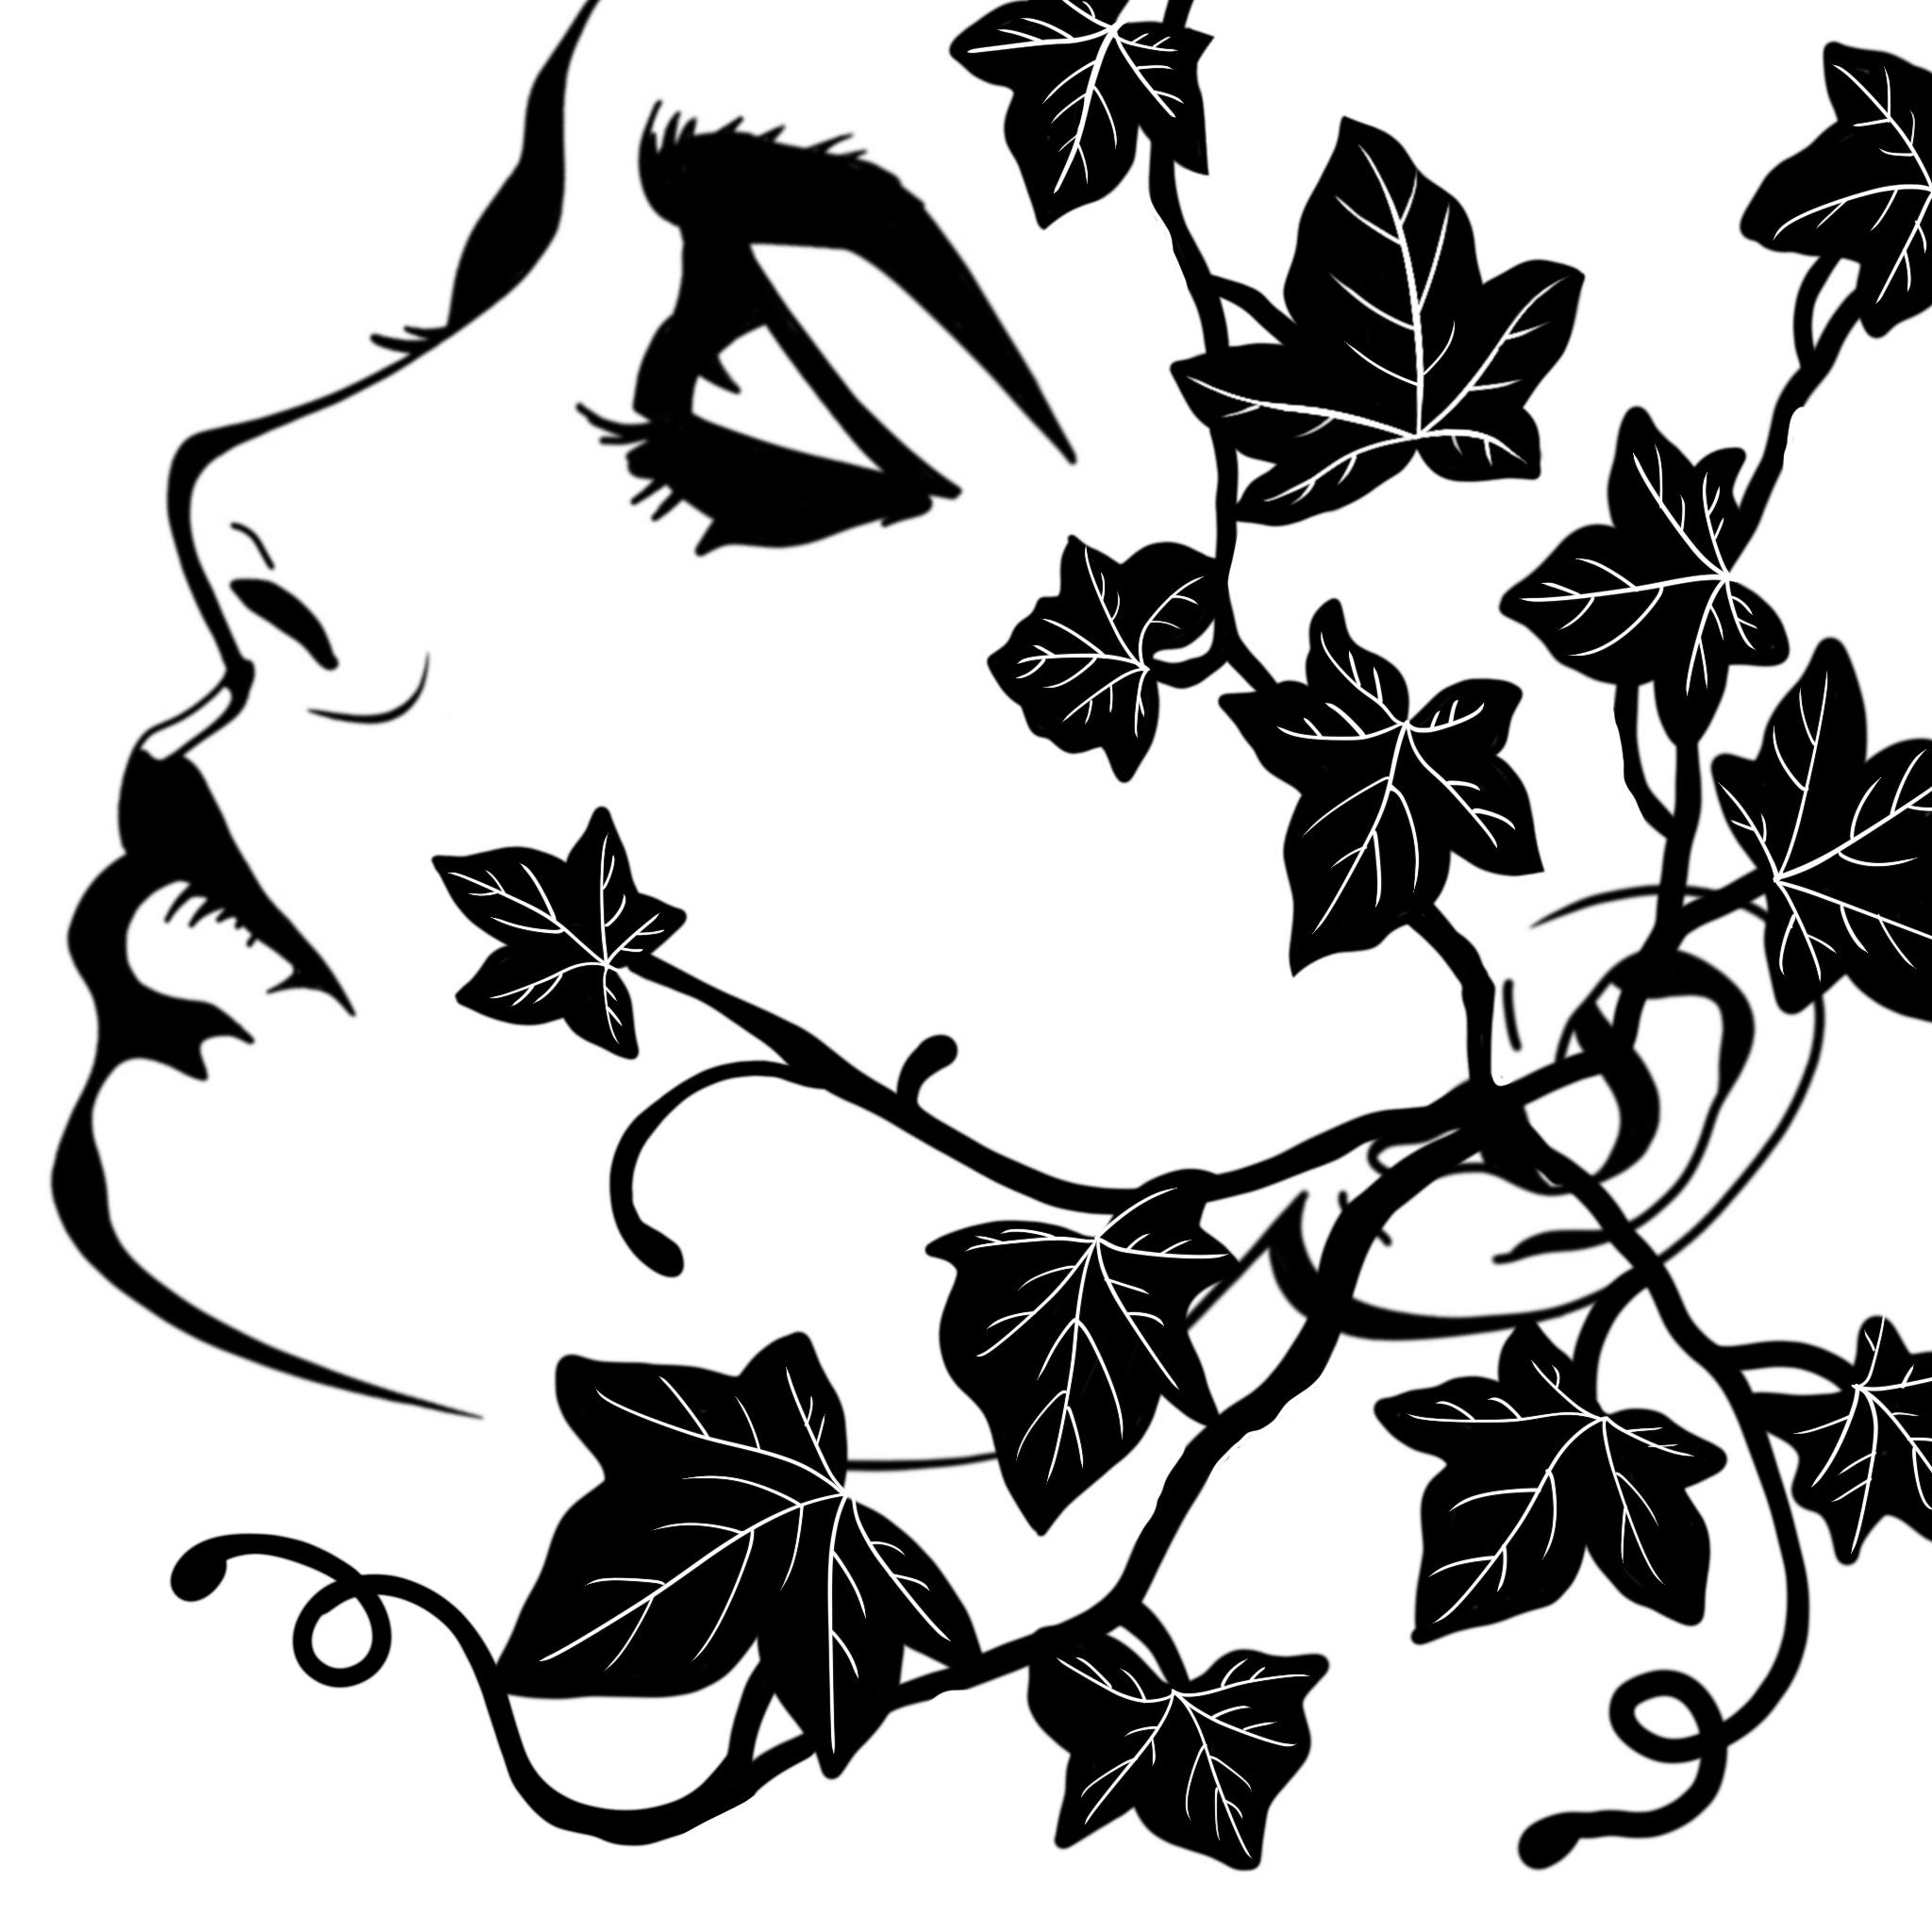 Untitled_Artwork(4).jpg